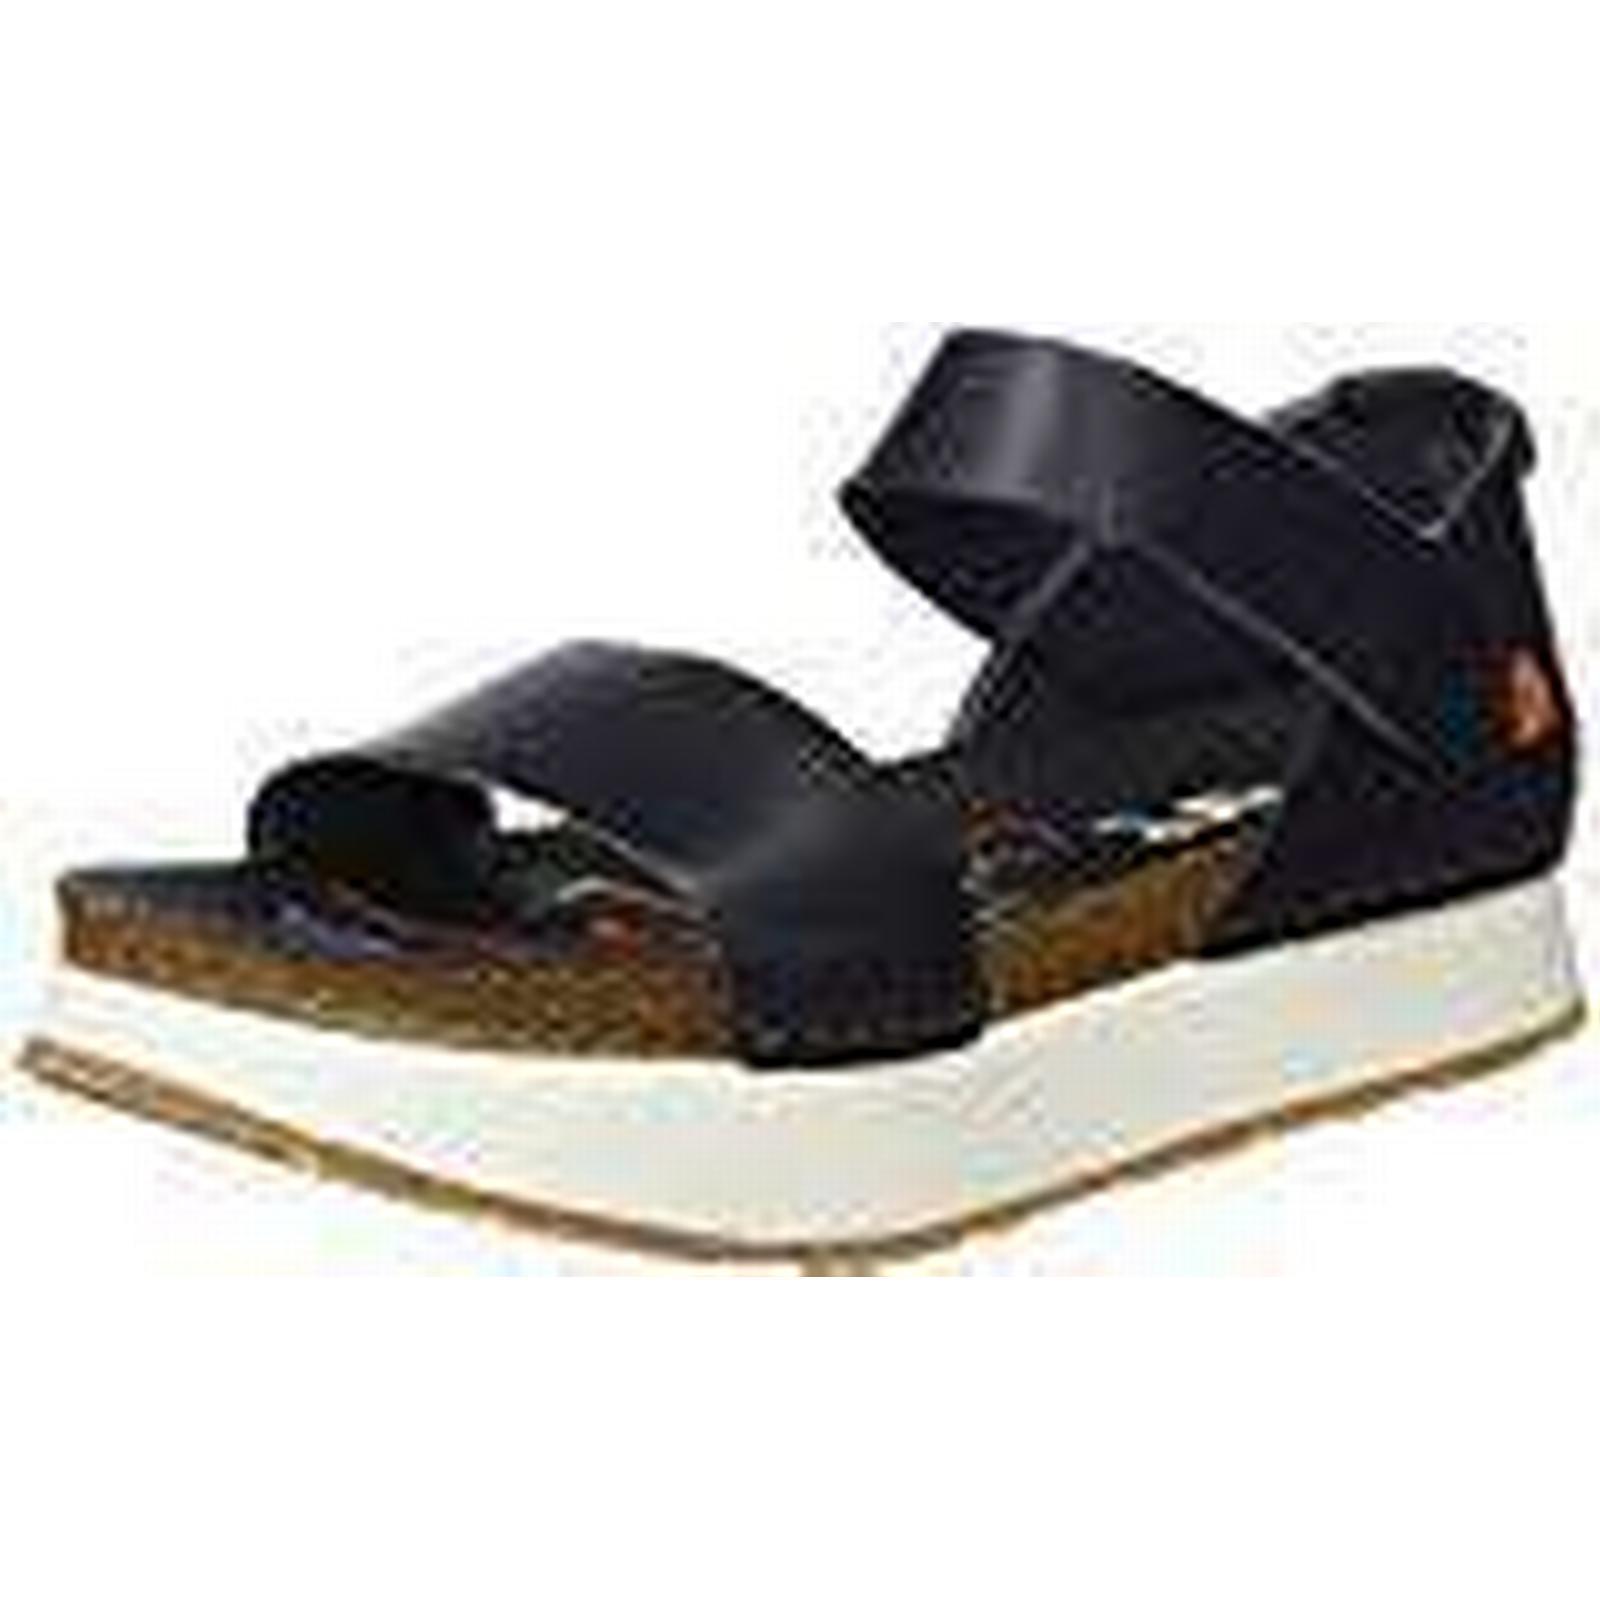 Art 1260 Toe Mojave Mykonos, Women's Open Toe 1260 Platform Sandals, Black (Black), 5 UK (38 EU) d26f03